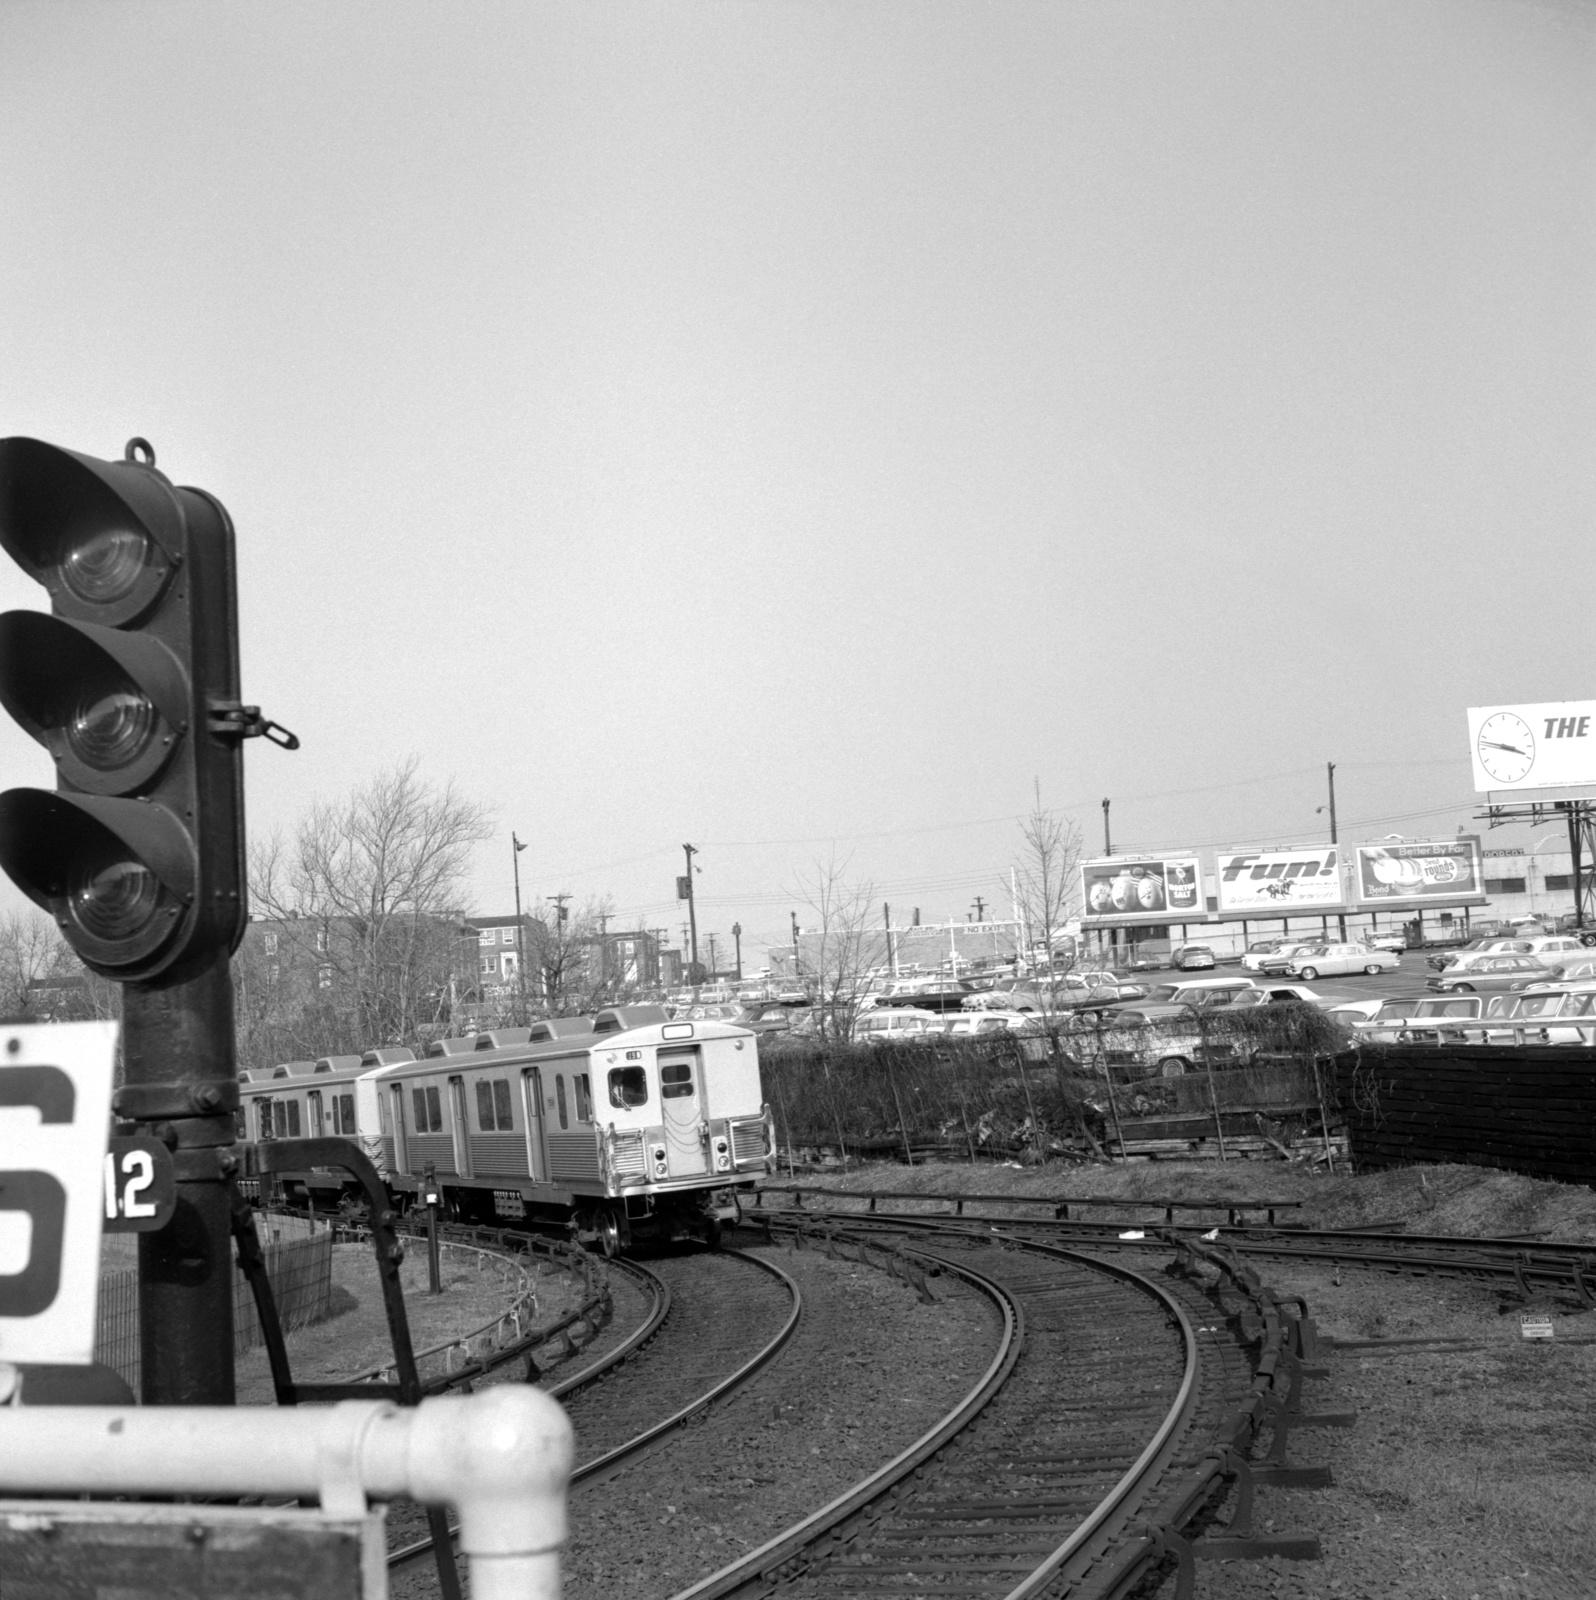 (718k, 1596x1600)<br><b>Country:</b> United States<br><b>City:</b> Philadelphia, PA<br><b>System:</b> SEPTA (or Predecessor)<br><b>Line:</b> Market-Frankford El<br><b>Location:</b> 69th Street<br><b>Car:</b> SEPTA M-3 (Budd, 1960)  <br><b>Collection of:</b> David Pirmann<br><b>Date:</b> 4/11/1964<br><b>Viewed (this week/total):</b> 1 / 52